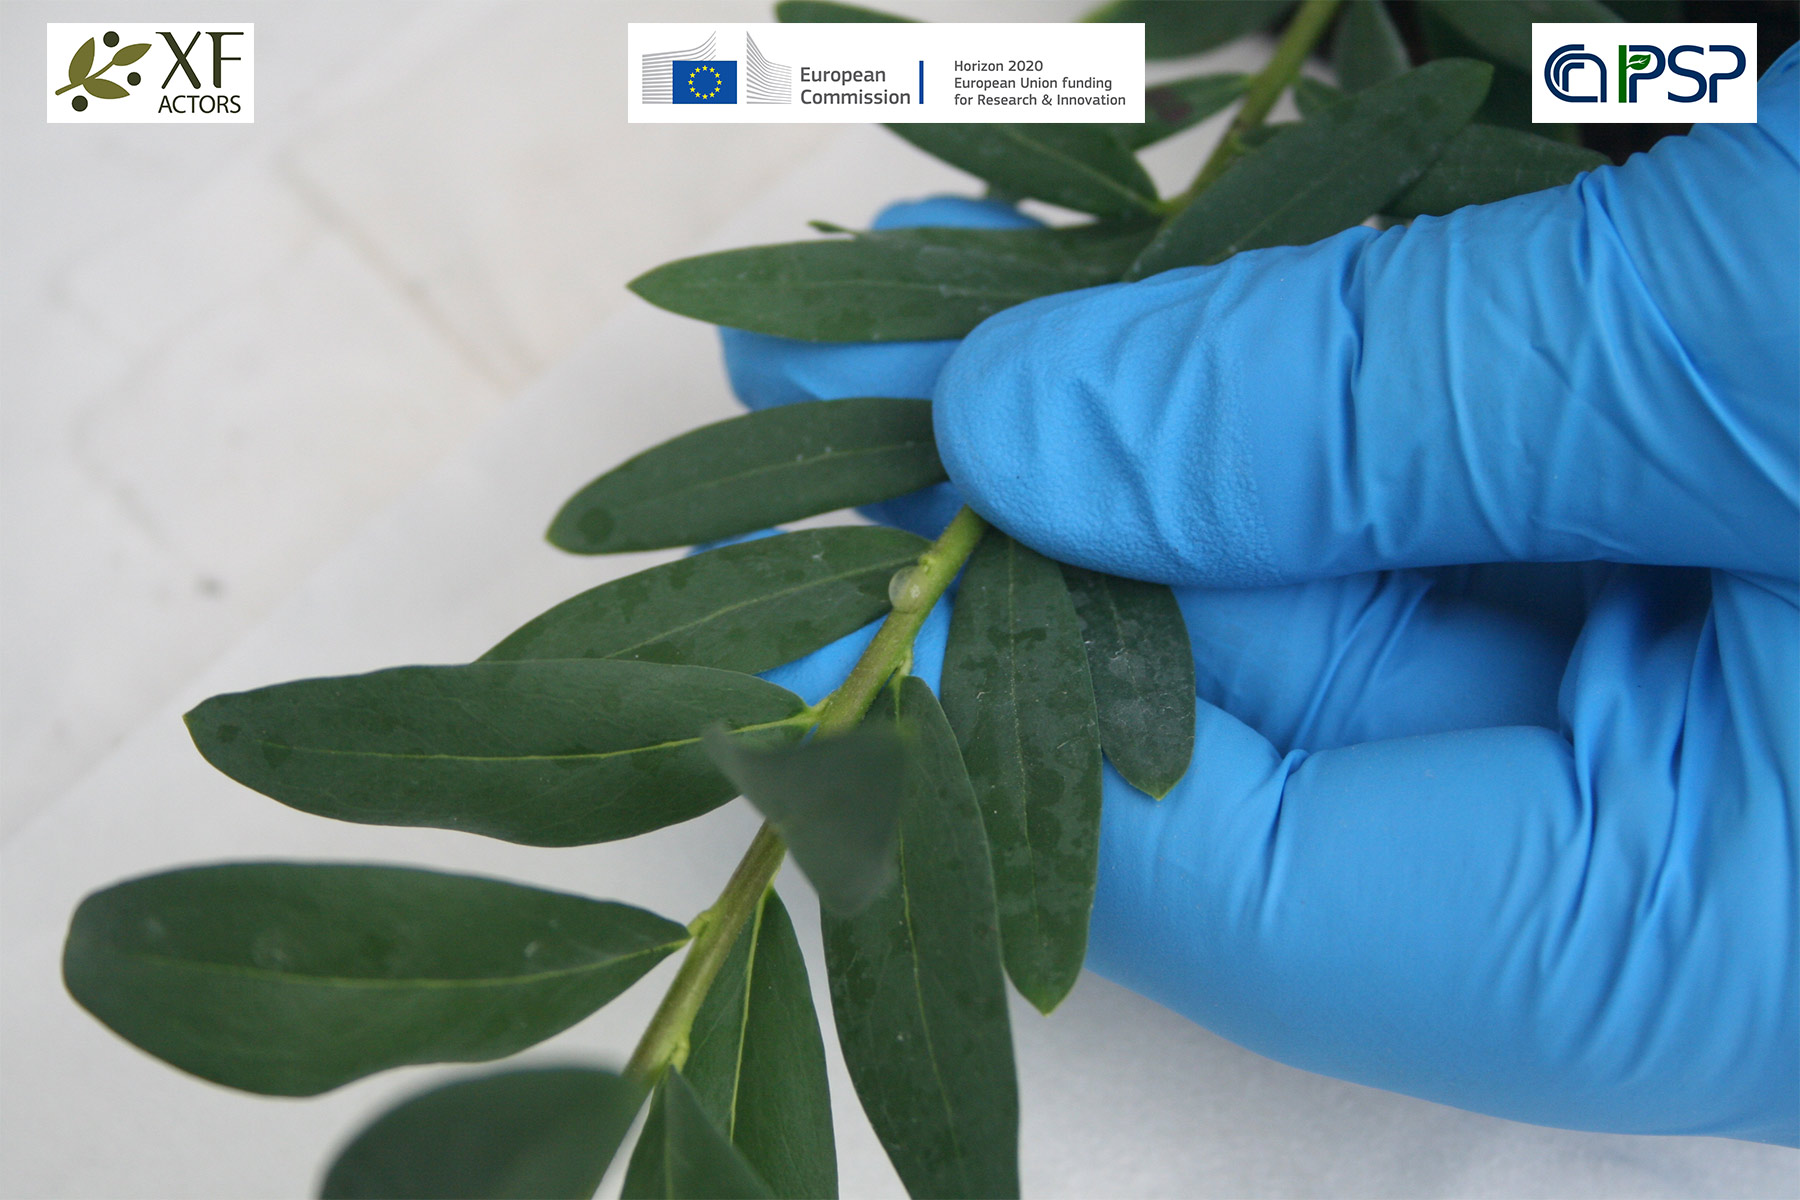 16 - inoculation Xf in Polygala myrtifolia